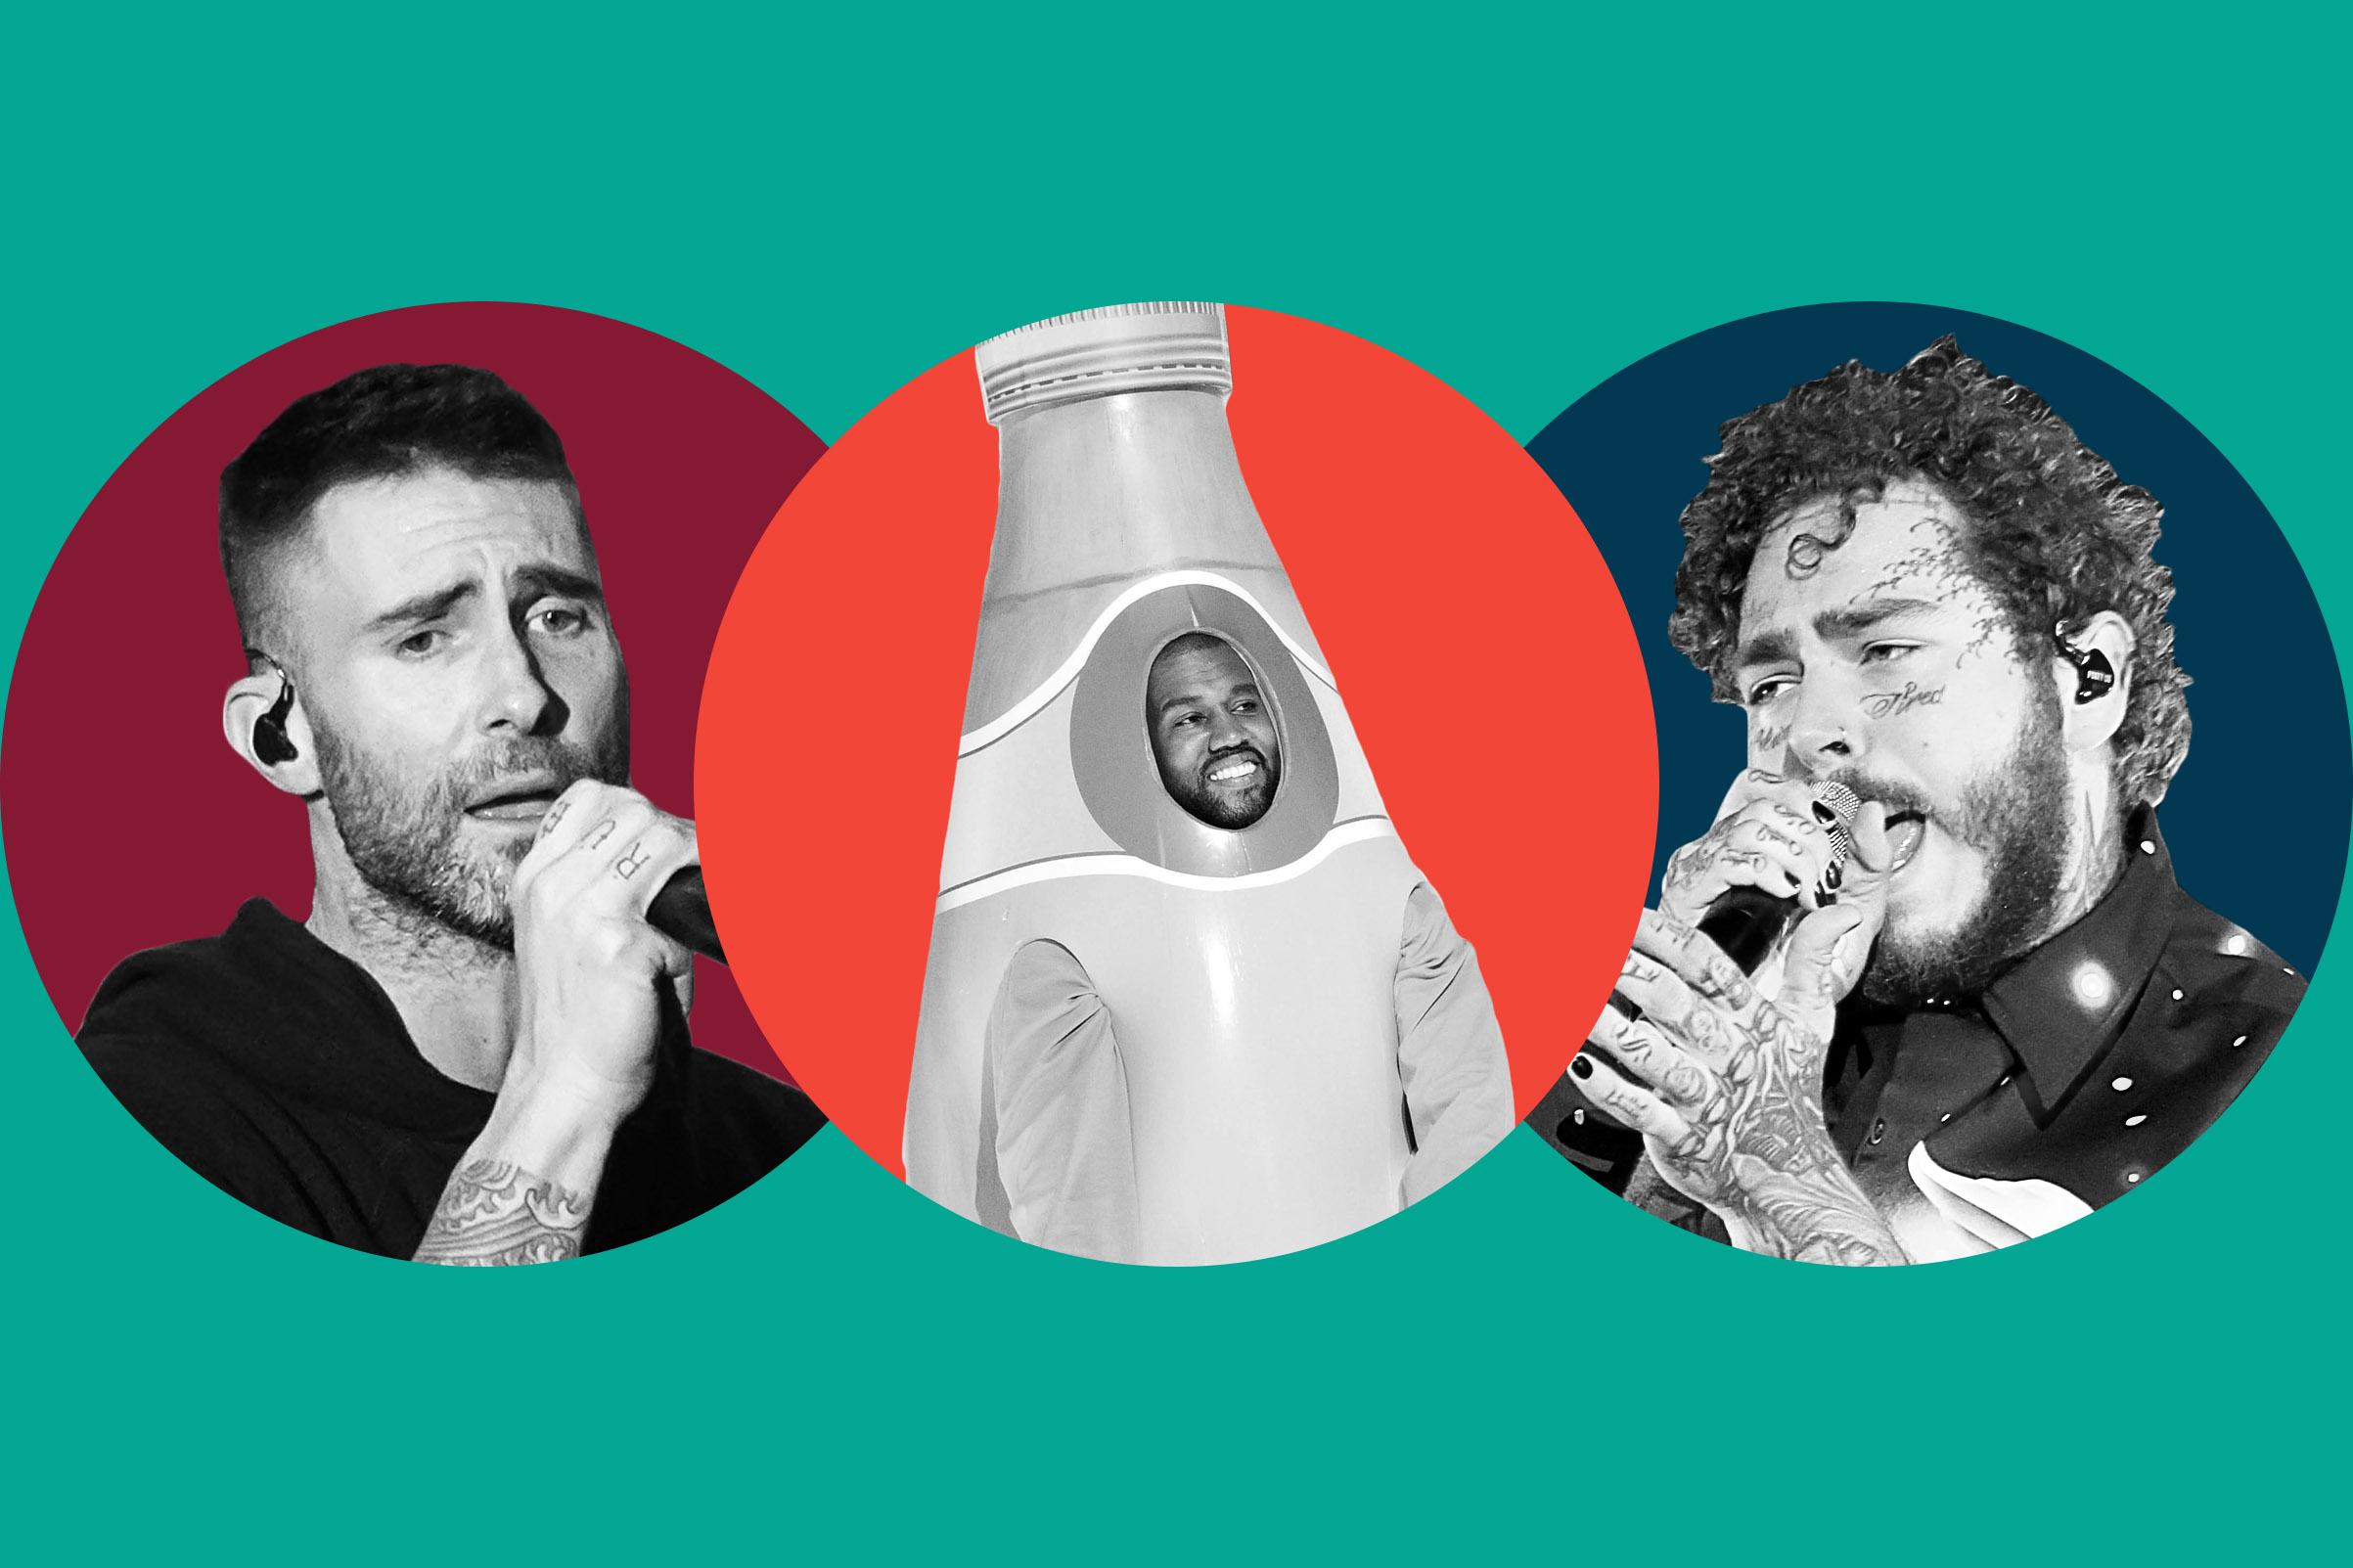 Adam Levine; Kanye West; Post Malone